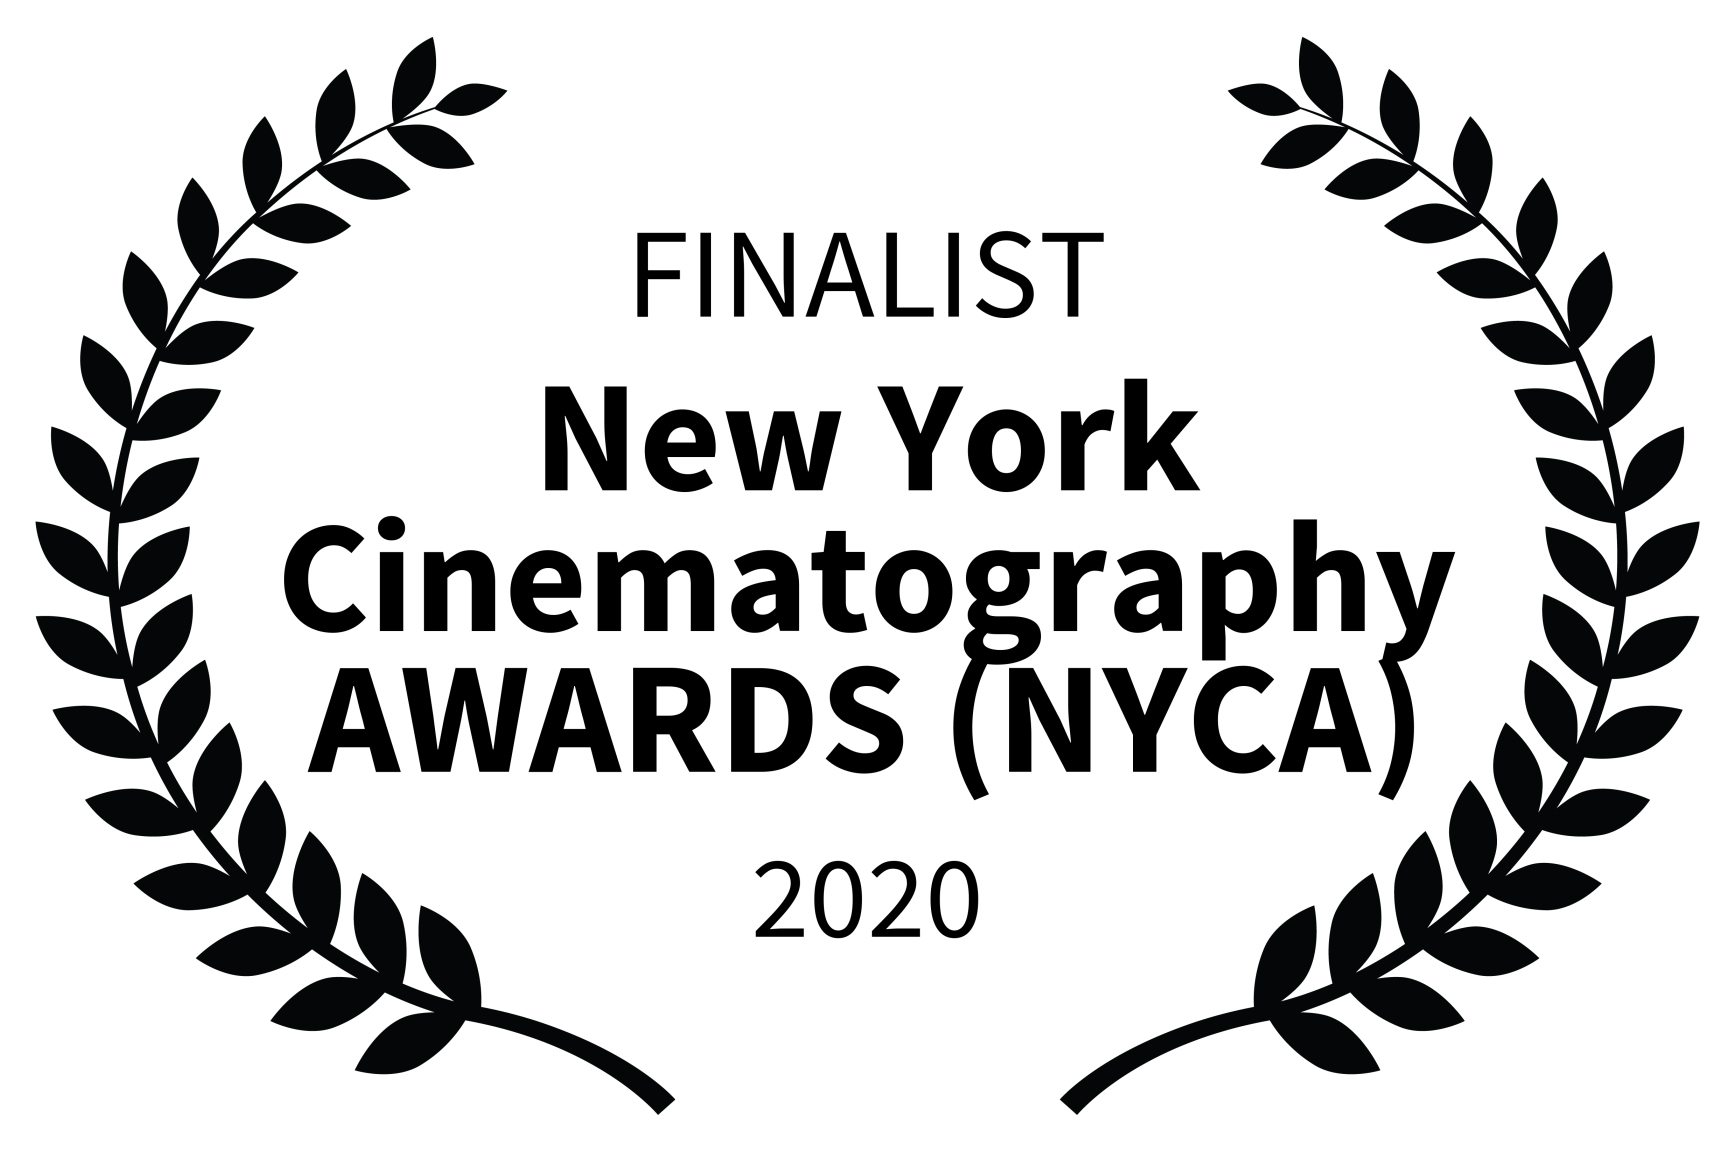 FINALIST---New-York-Cinematography-AWARDS-NYCA---2020